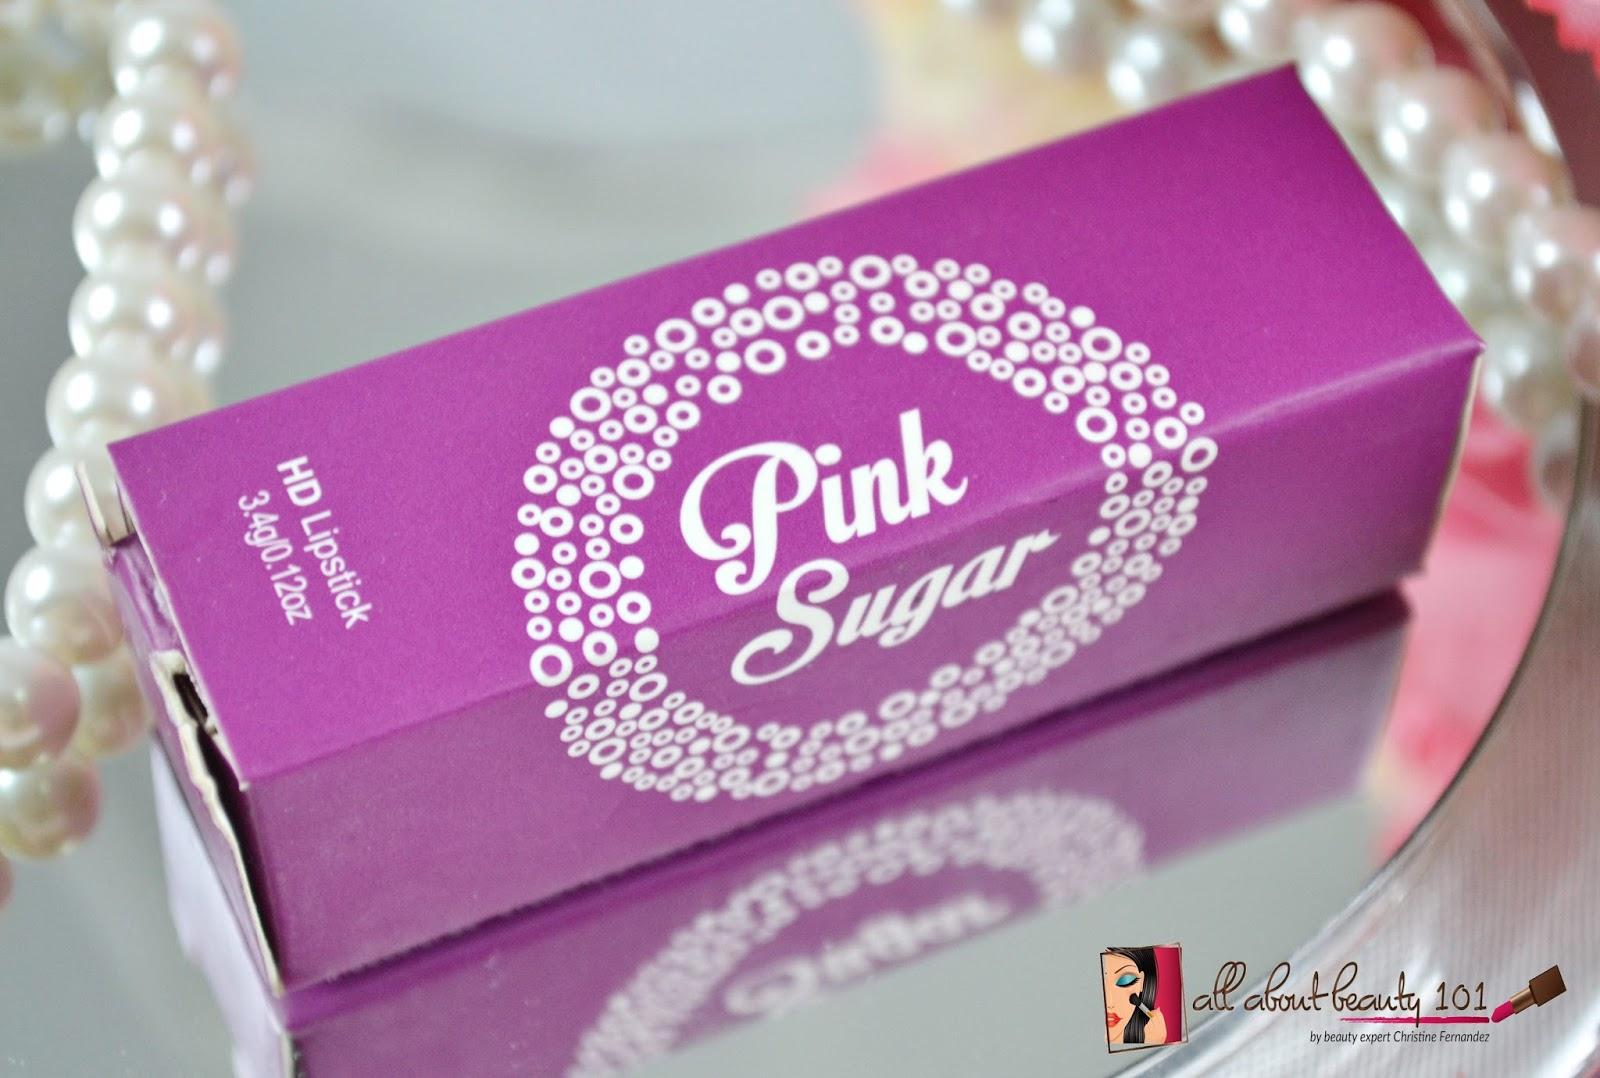 Pink Sugar: HD Lipstick In Gossip   All About Beauty 101